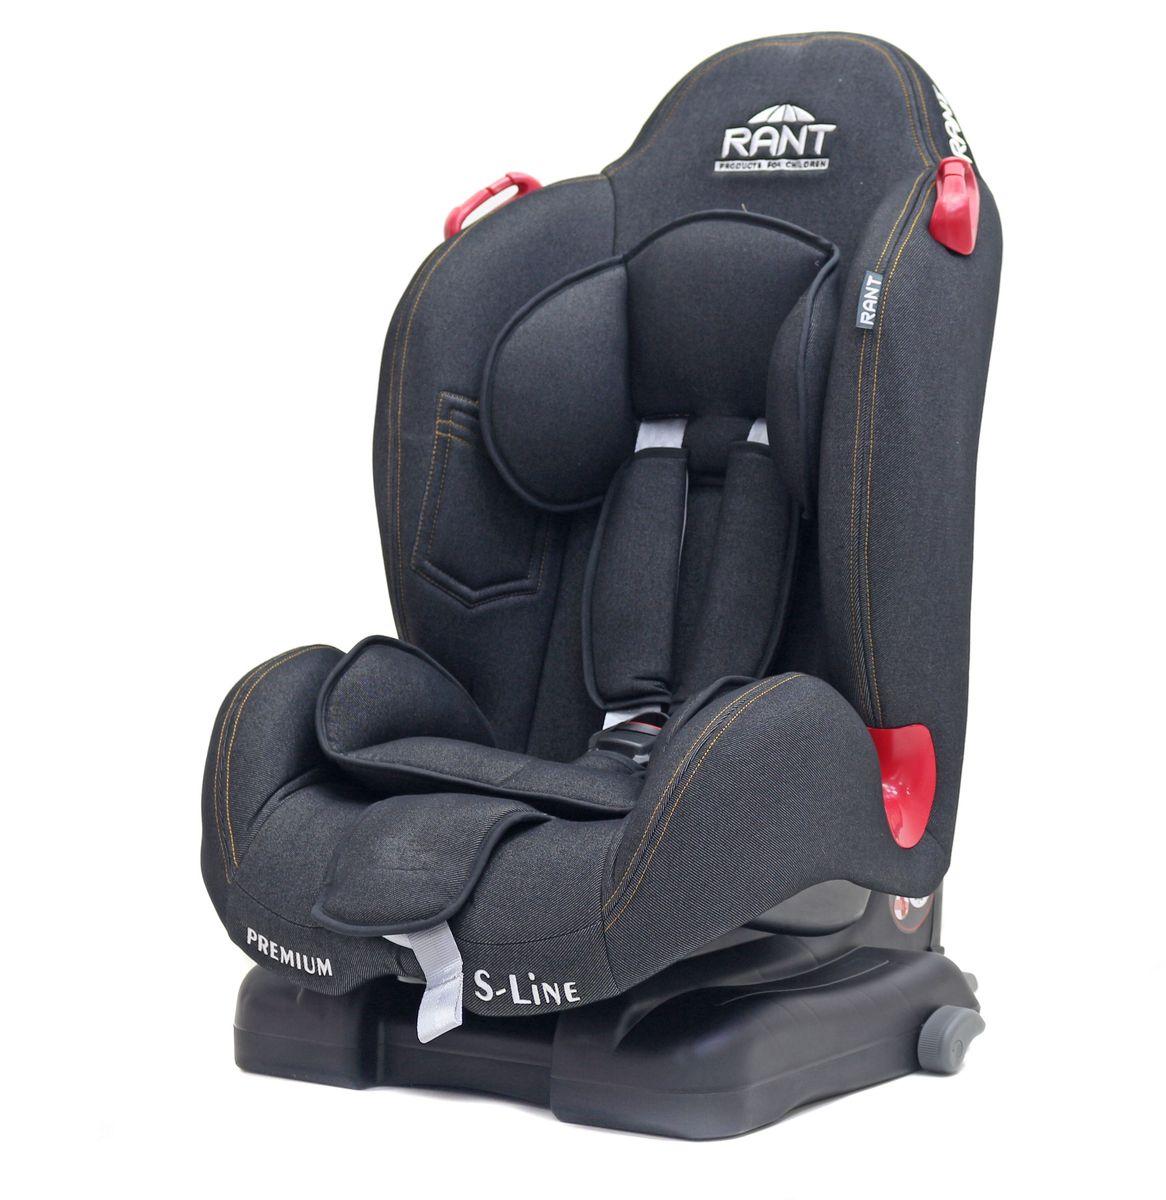 Rant Автокресло Premium Isofix цвет джинс от 9 до 25 кг -  Автокресла и аксессуары